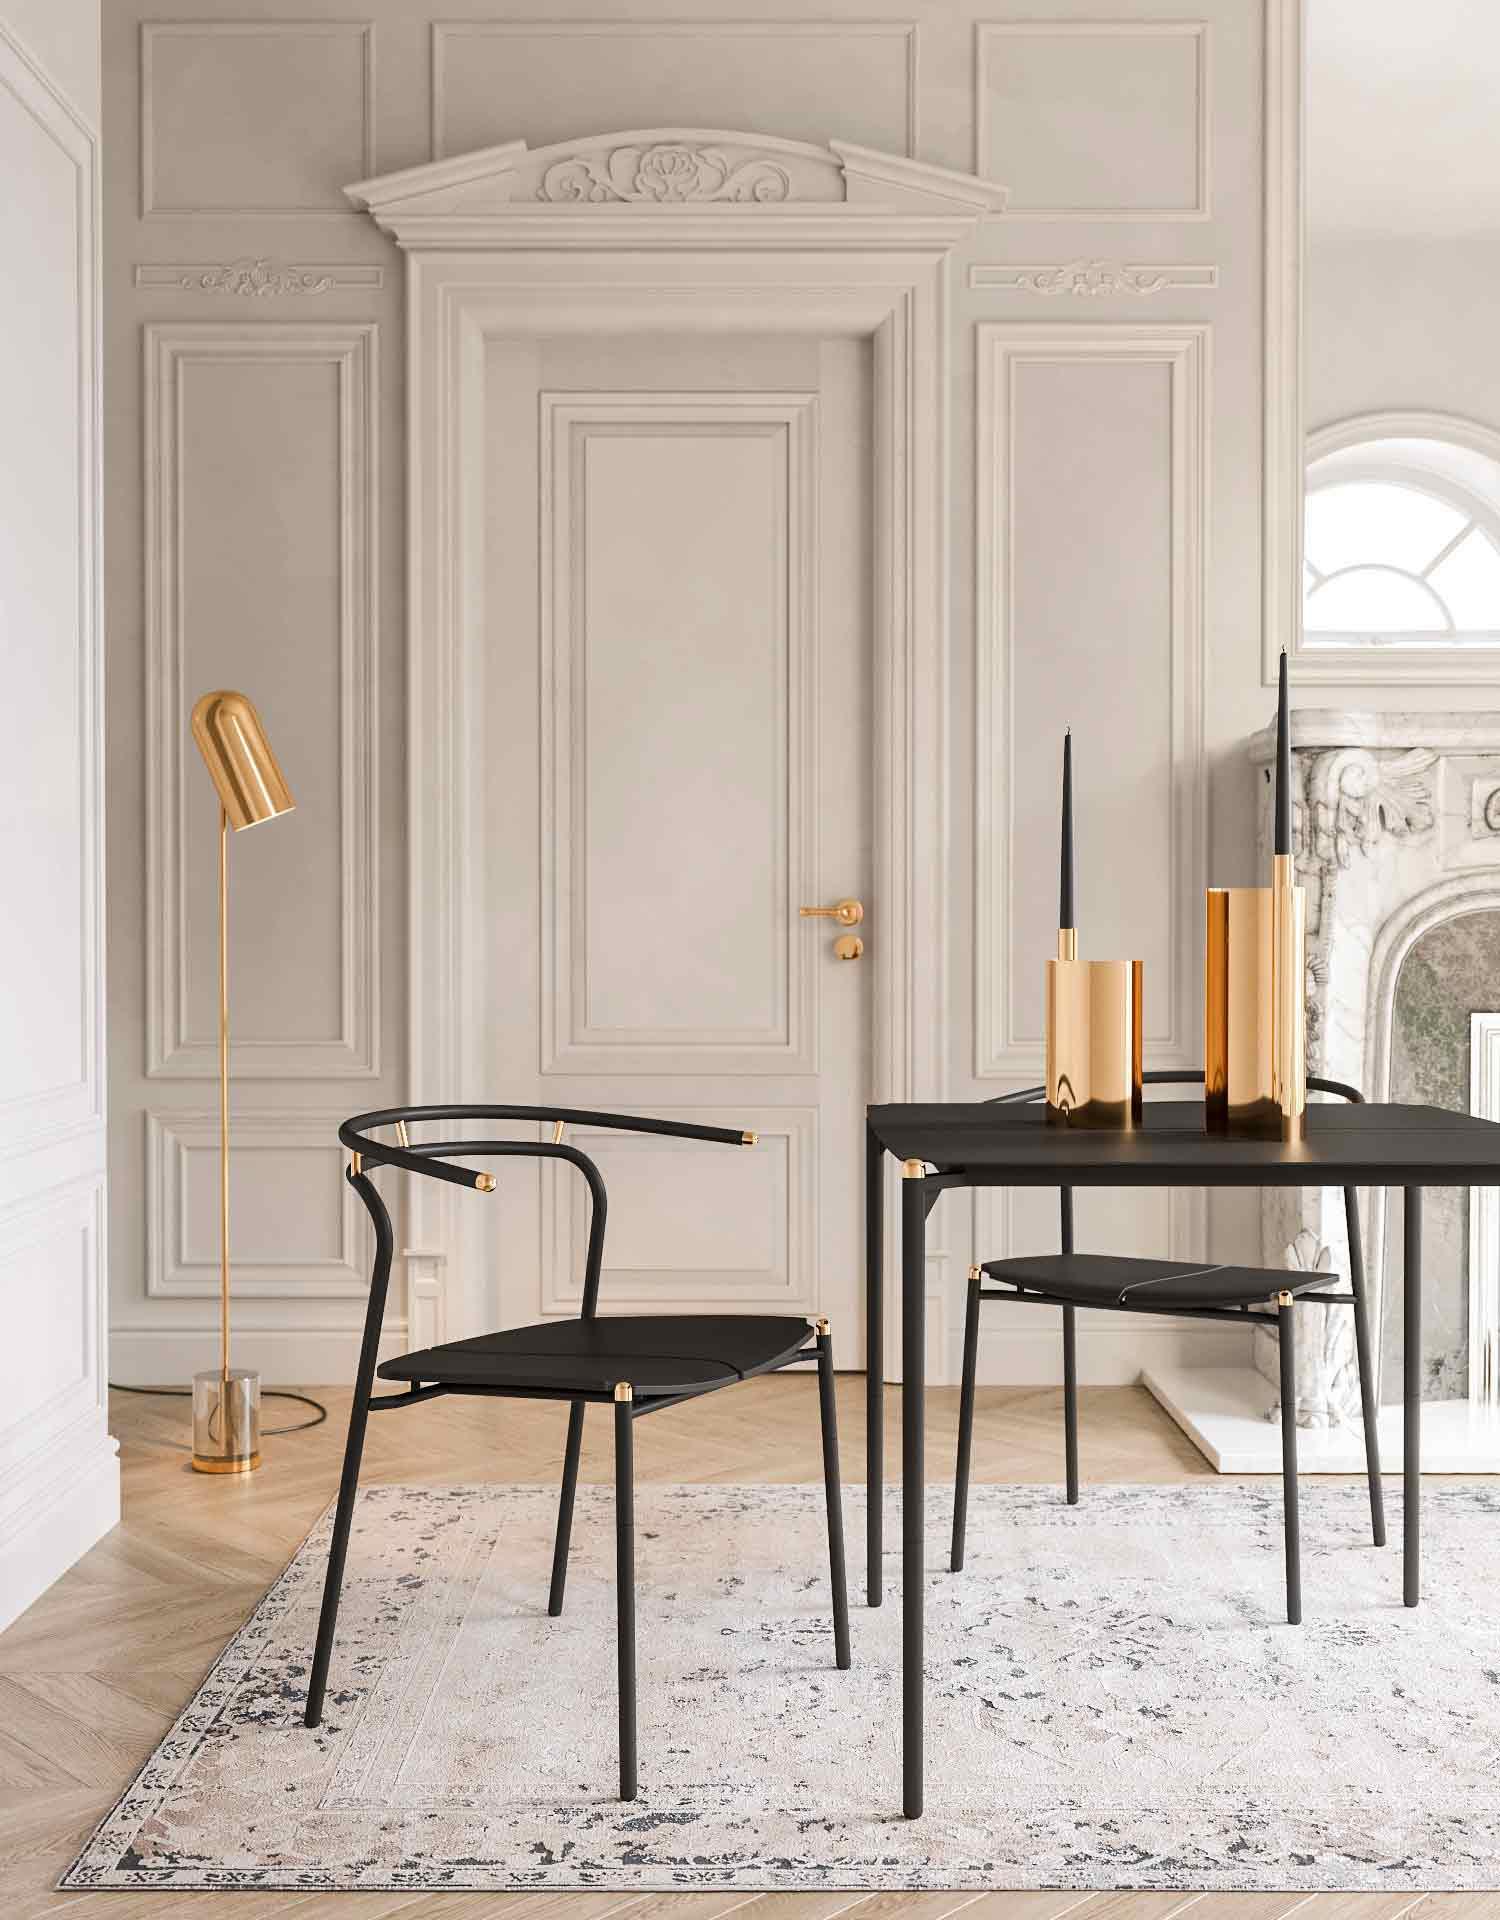 The Evolution Of Contemporary Interior Design Goodhomes Co In